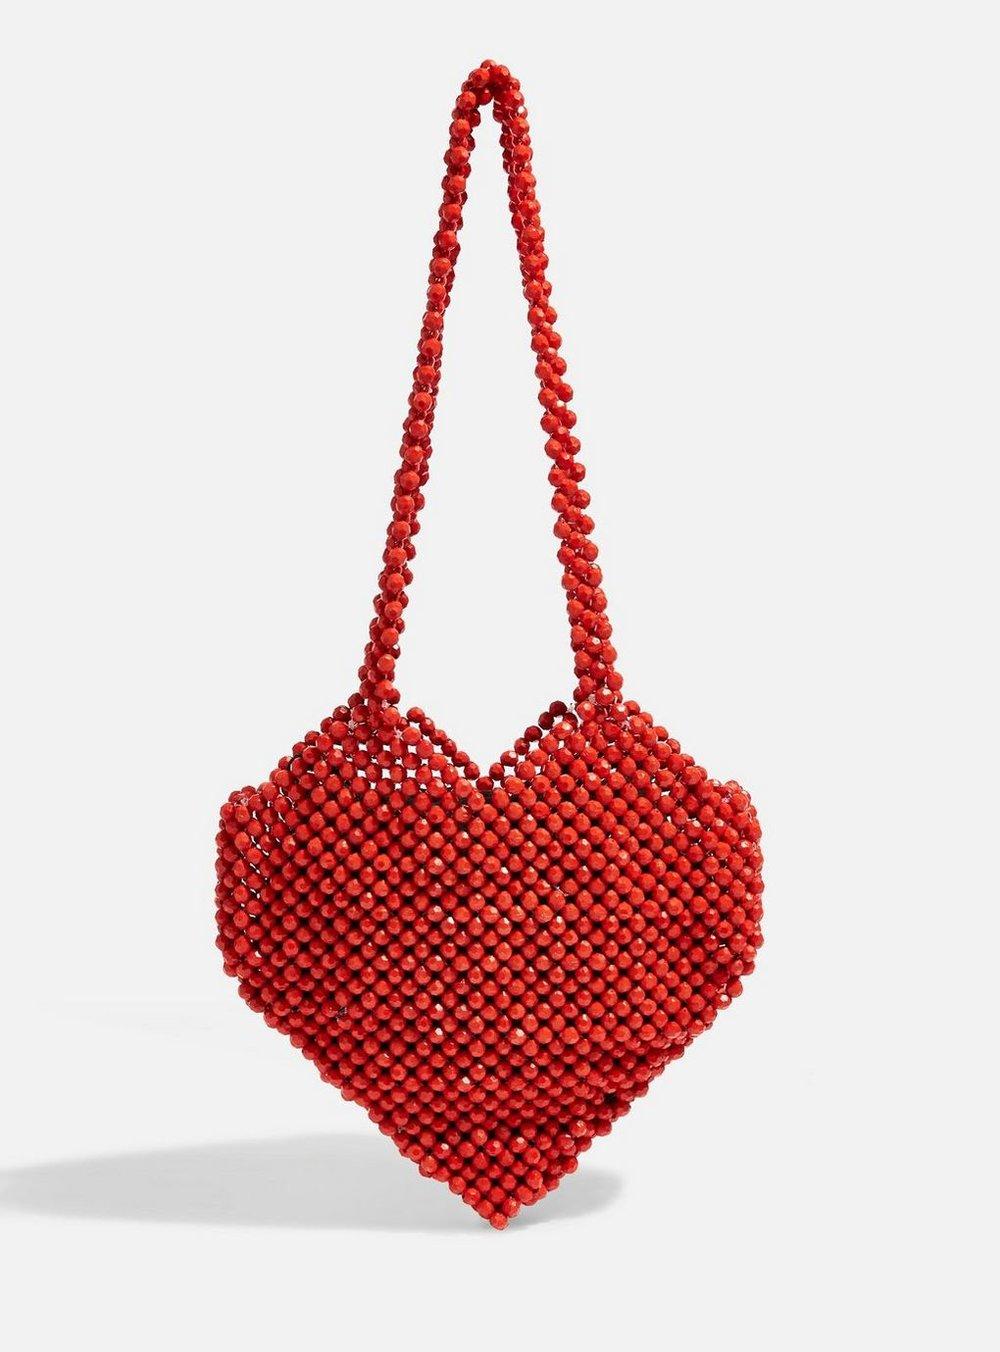 Heart Beaded Shoulder Bag By Topshop